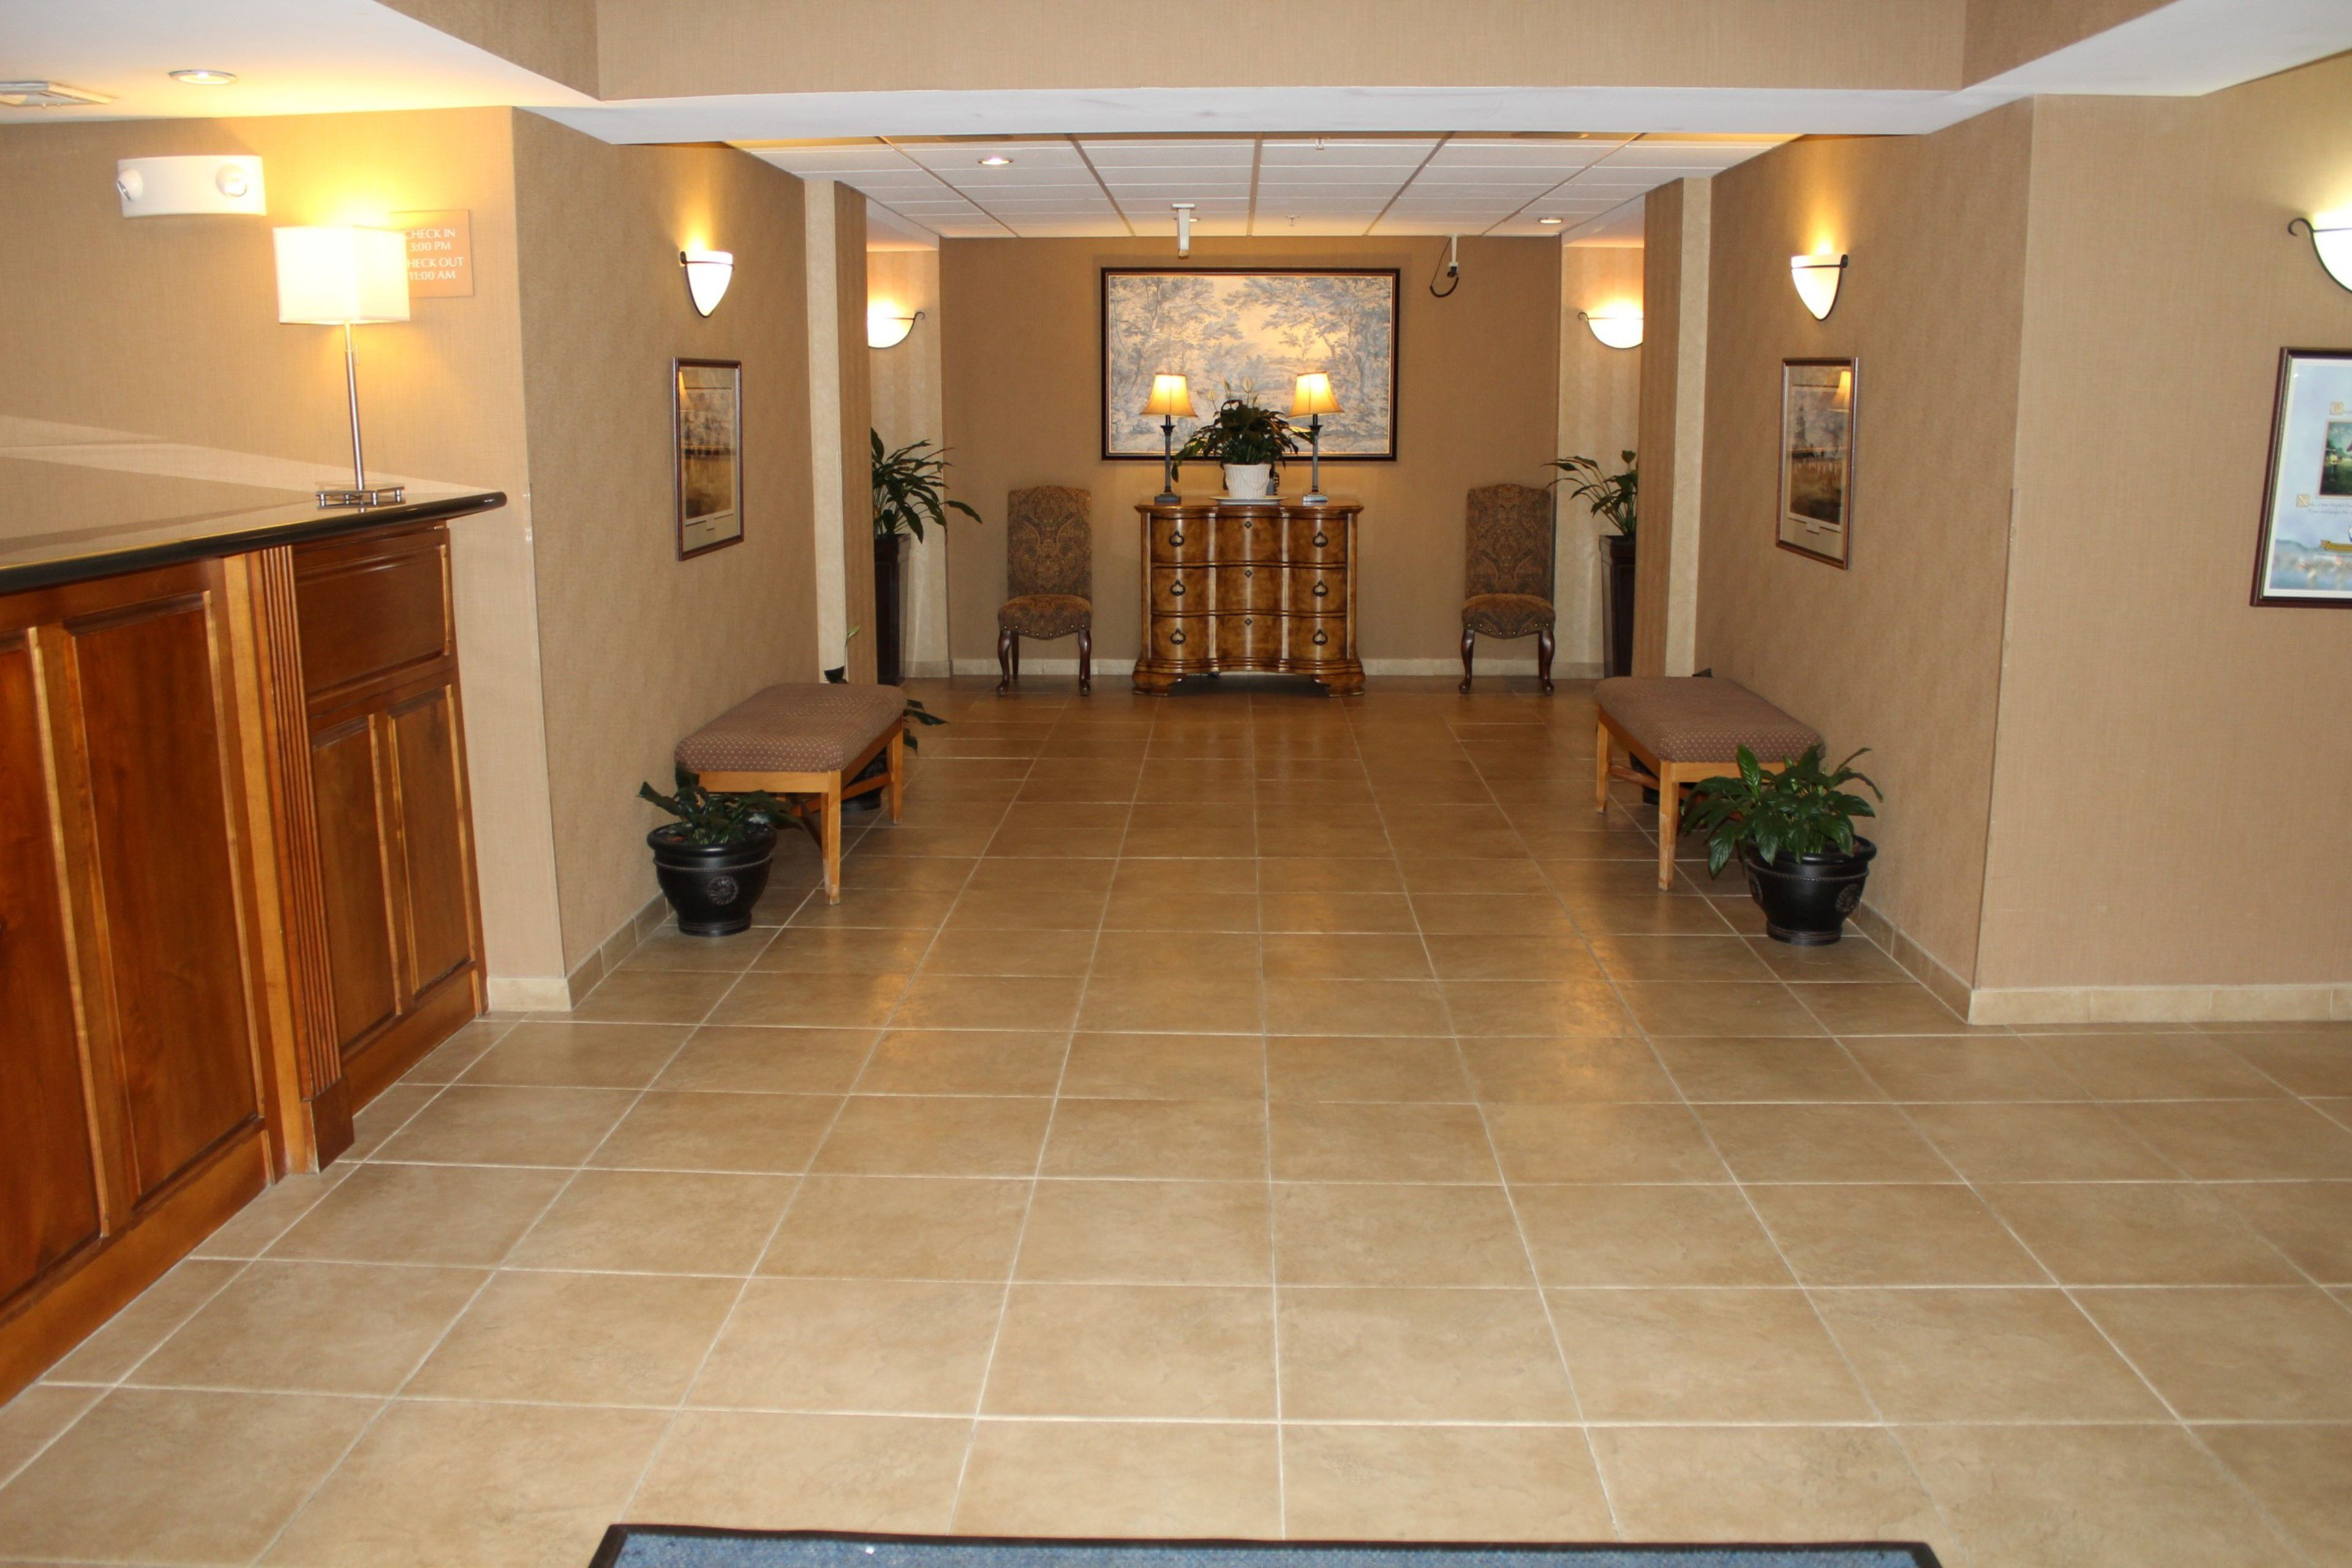 Holiday Inn Express & Suites Warrenton image 3